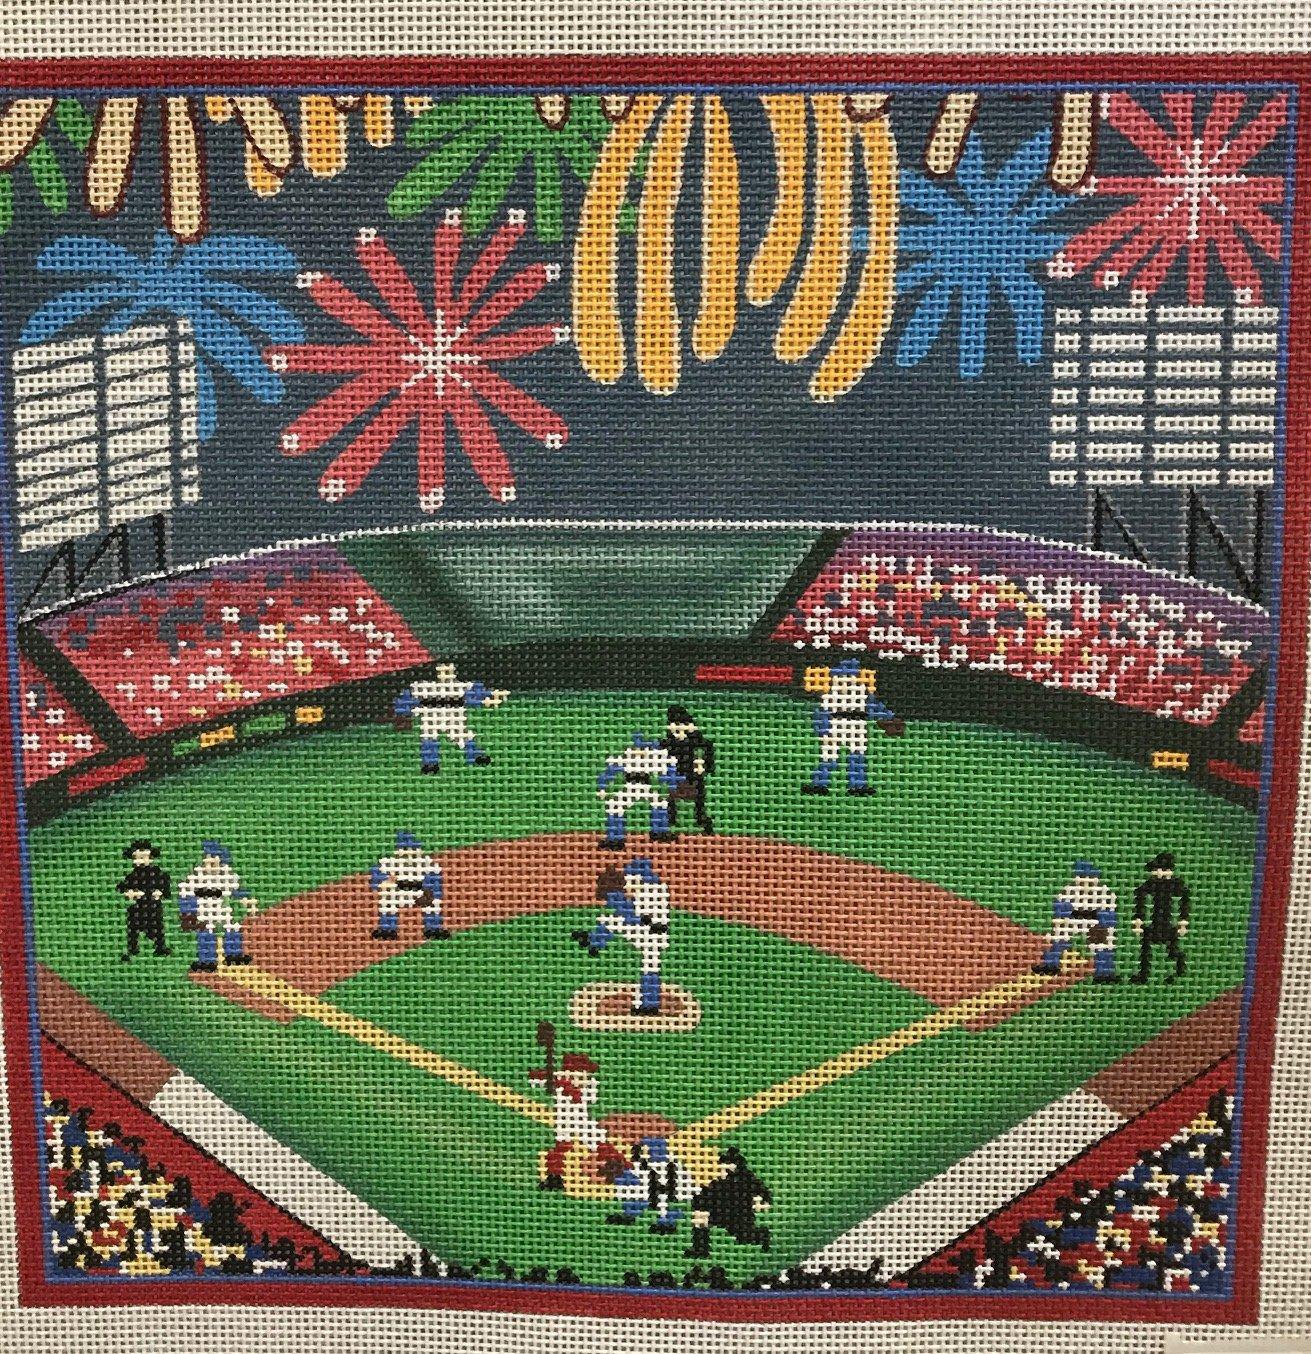 Stadium Baseball Game - Amanda Lawford